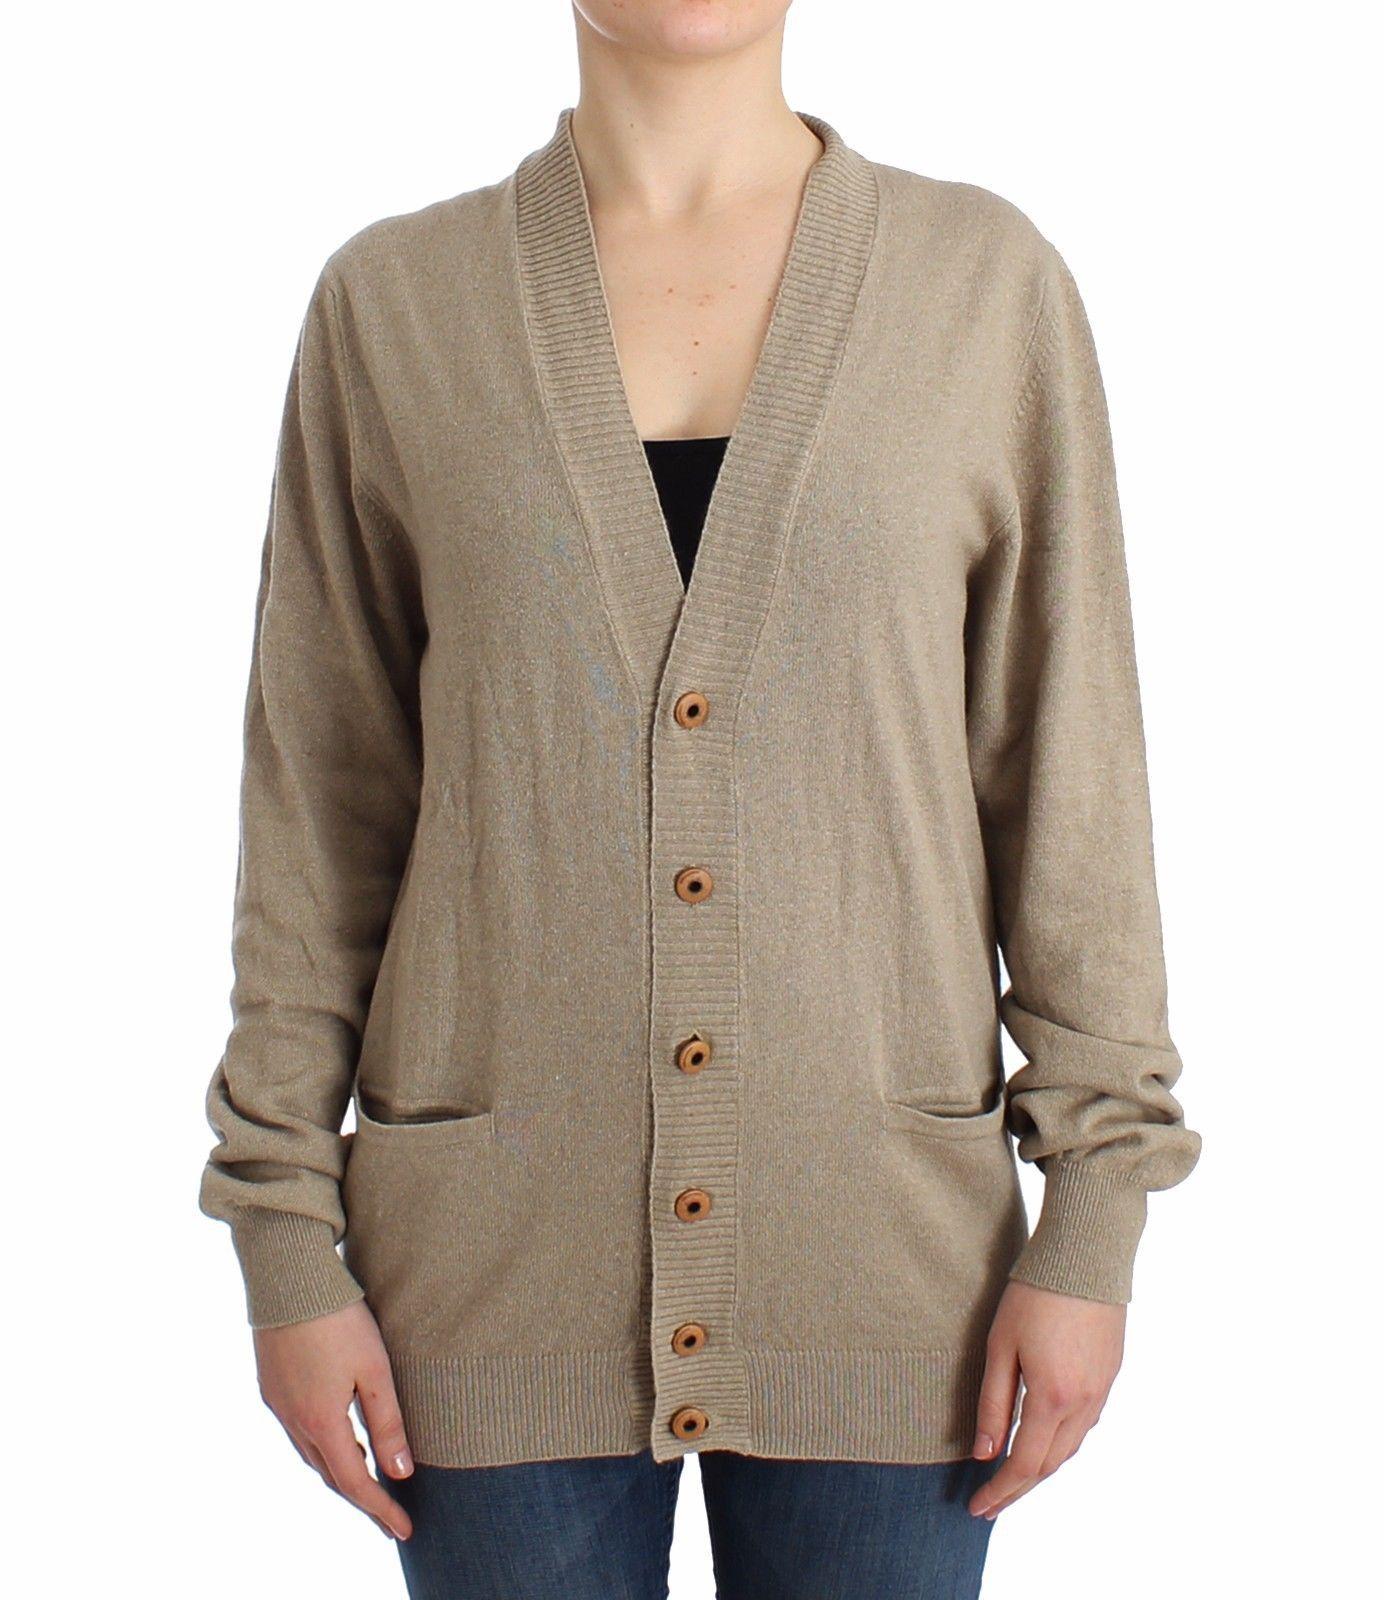 Ermanno Scervino Beige Cardigan Wool Cashmere Sweater Knit